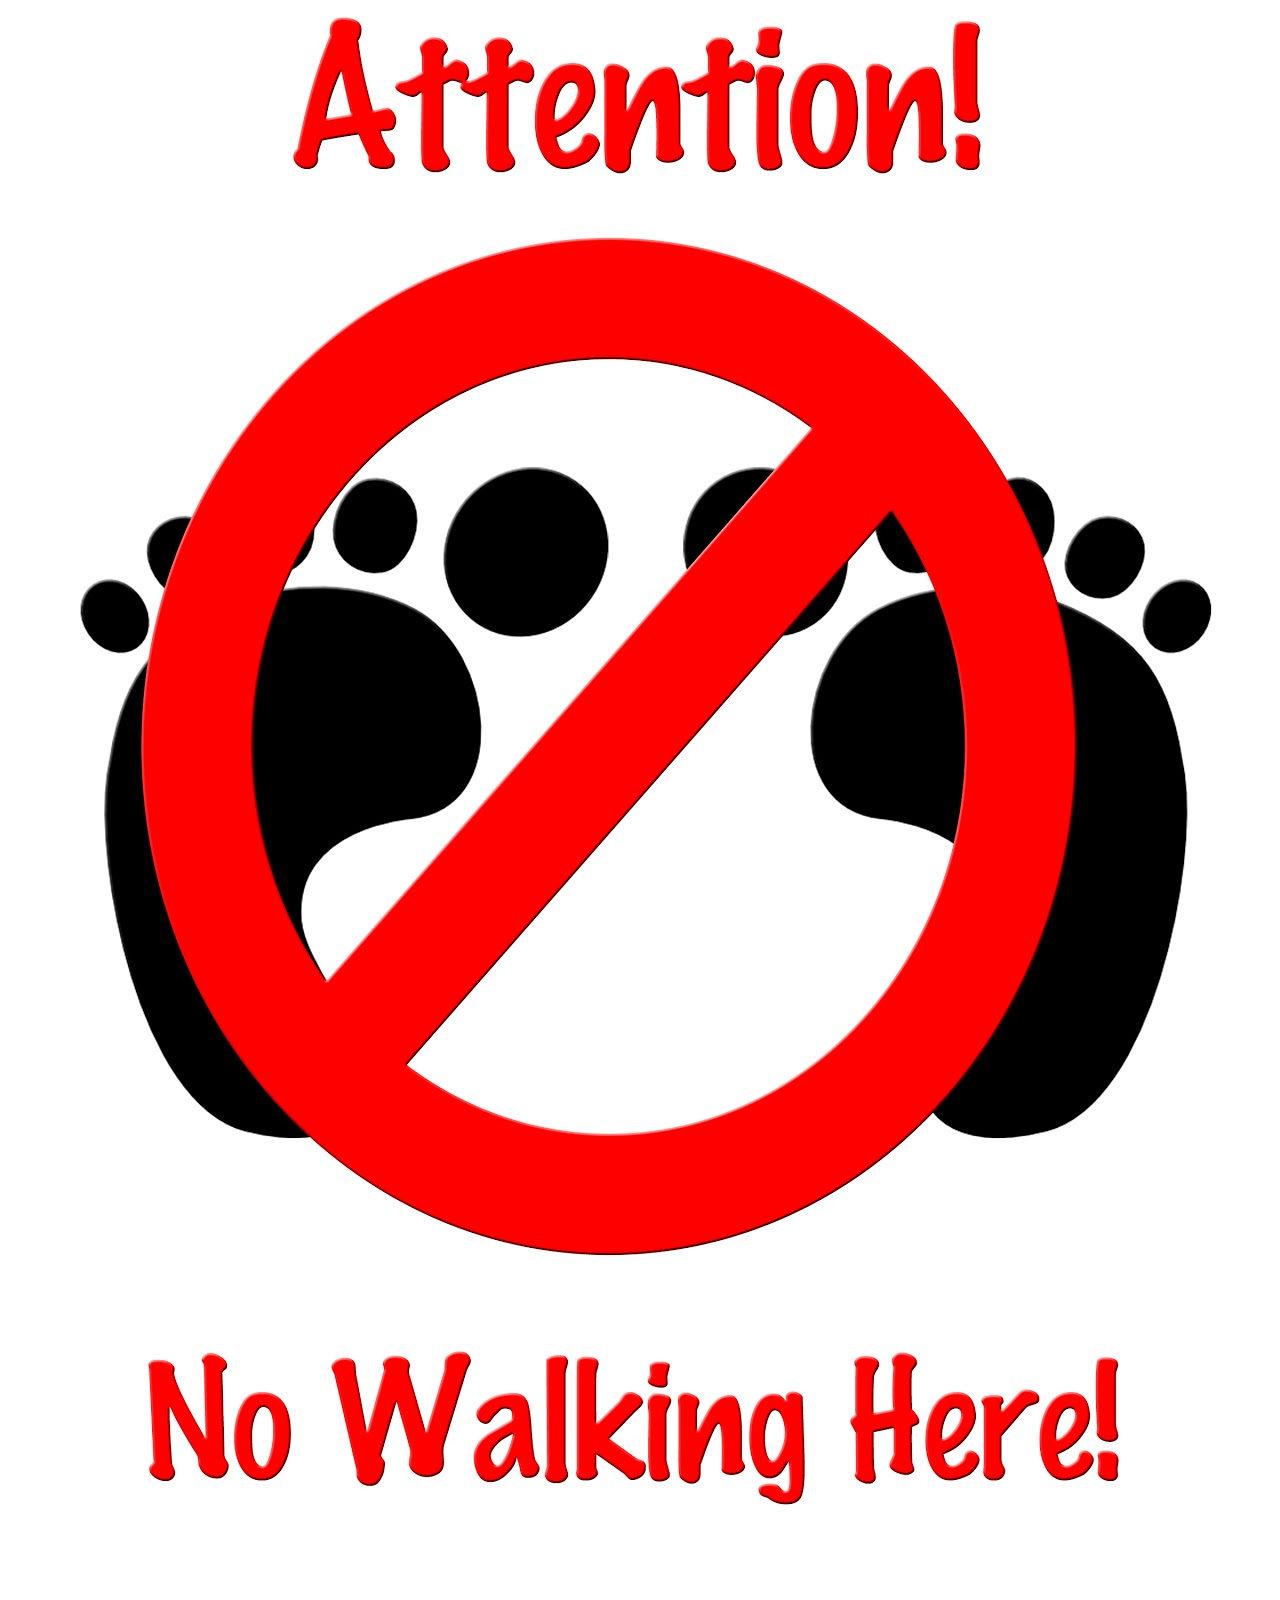 Walking Signs Worksheet